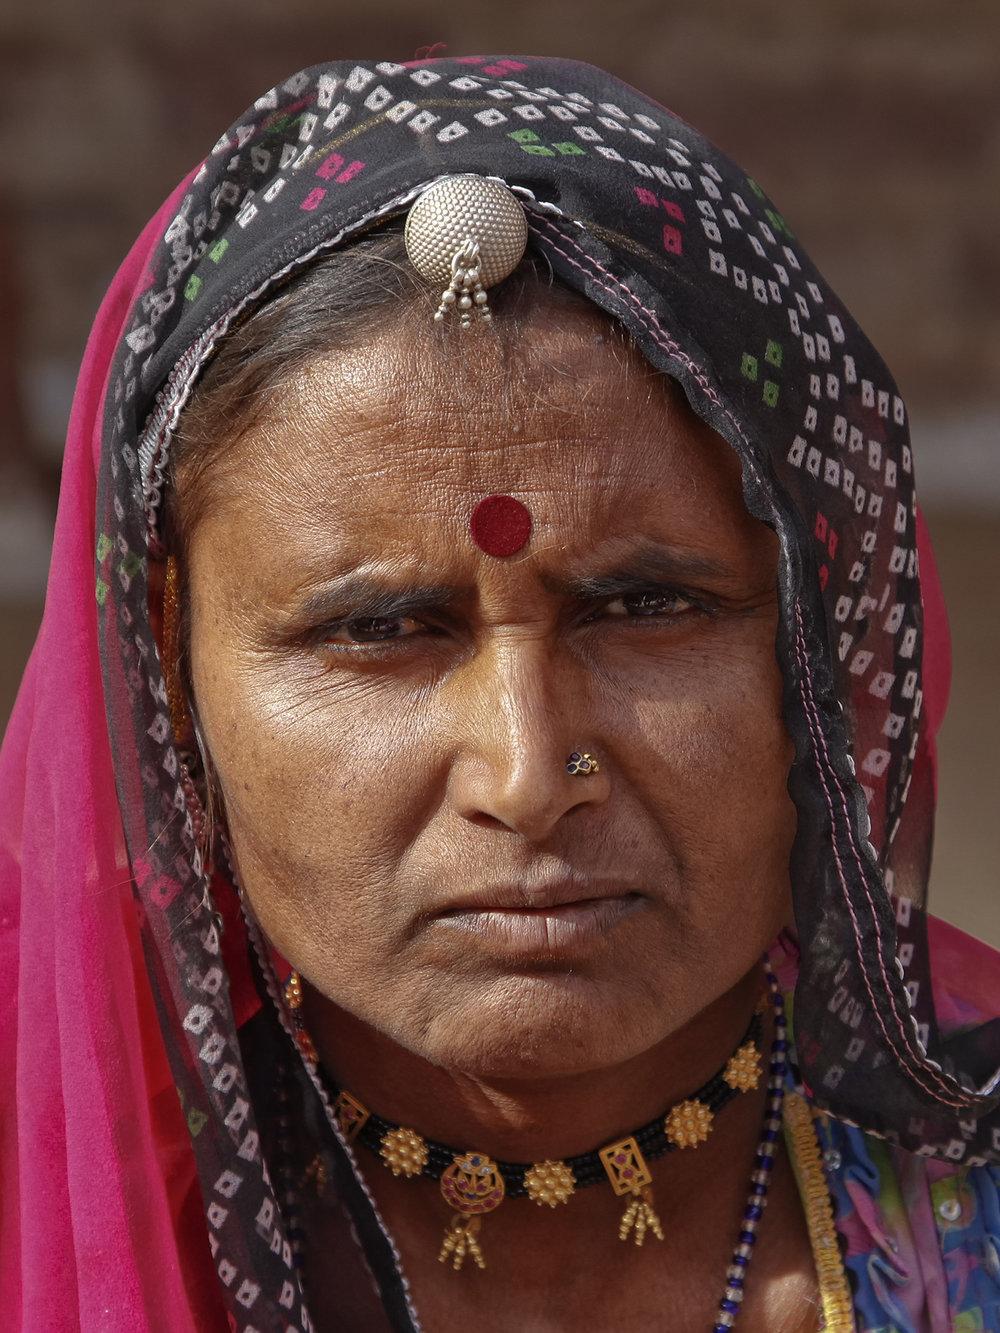 Brian_Jones_Women of India_Women of India - Rajasthan 4_5.jpg